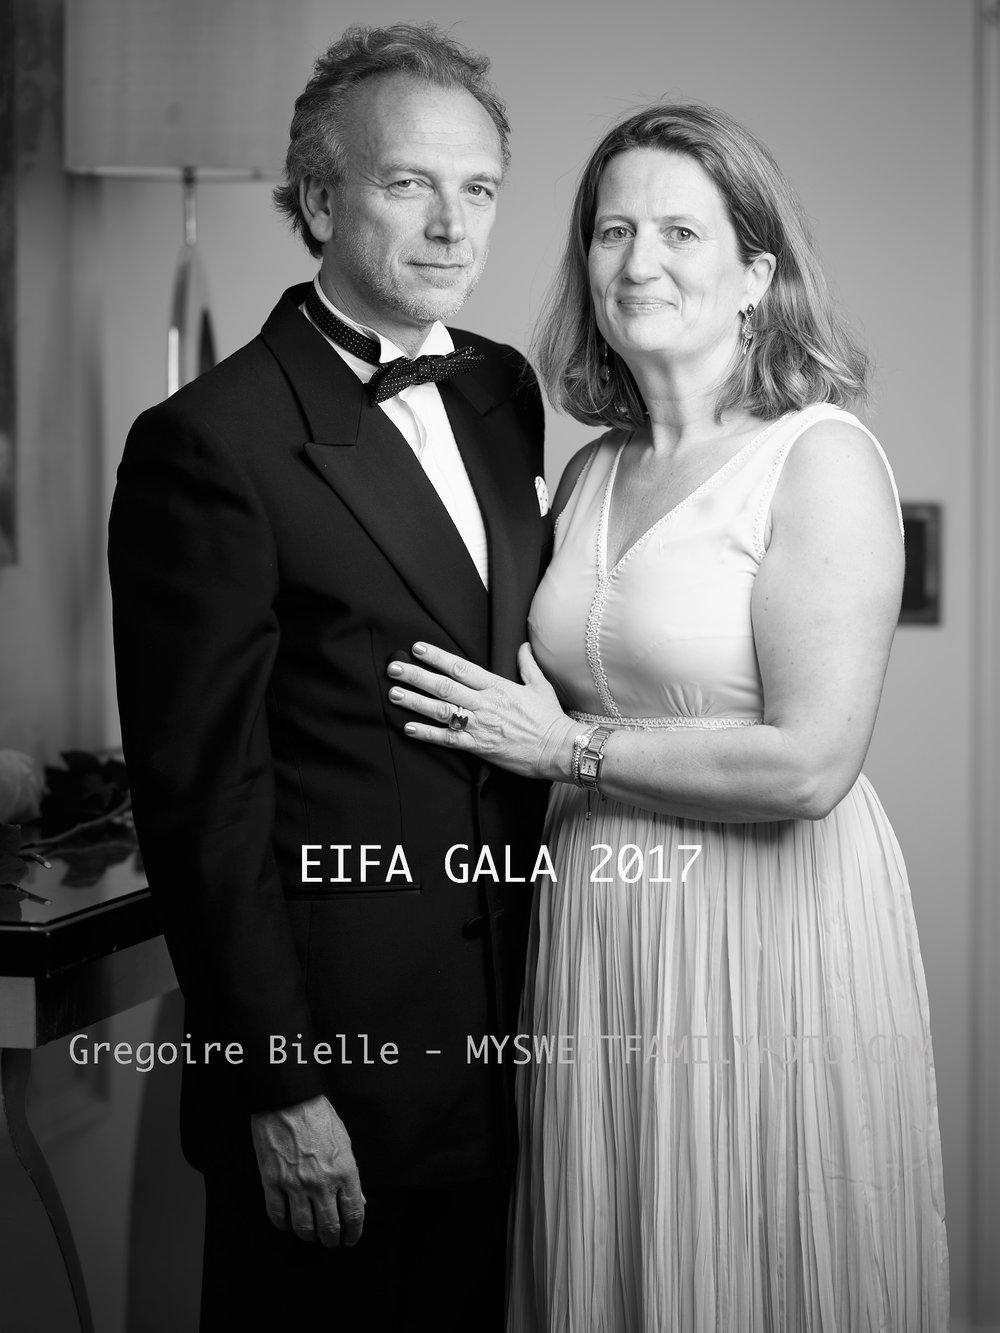 EIFA GALA 1312.jpg